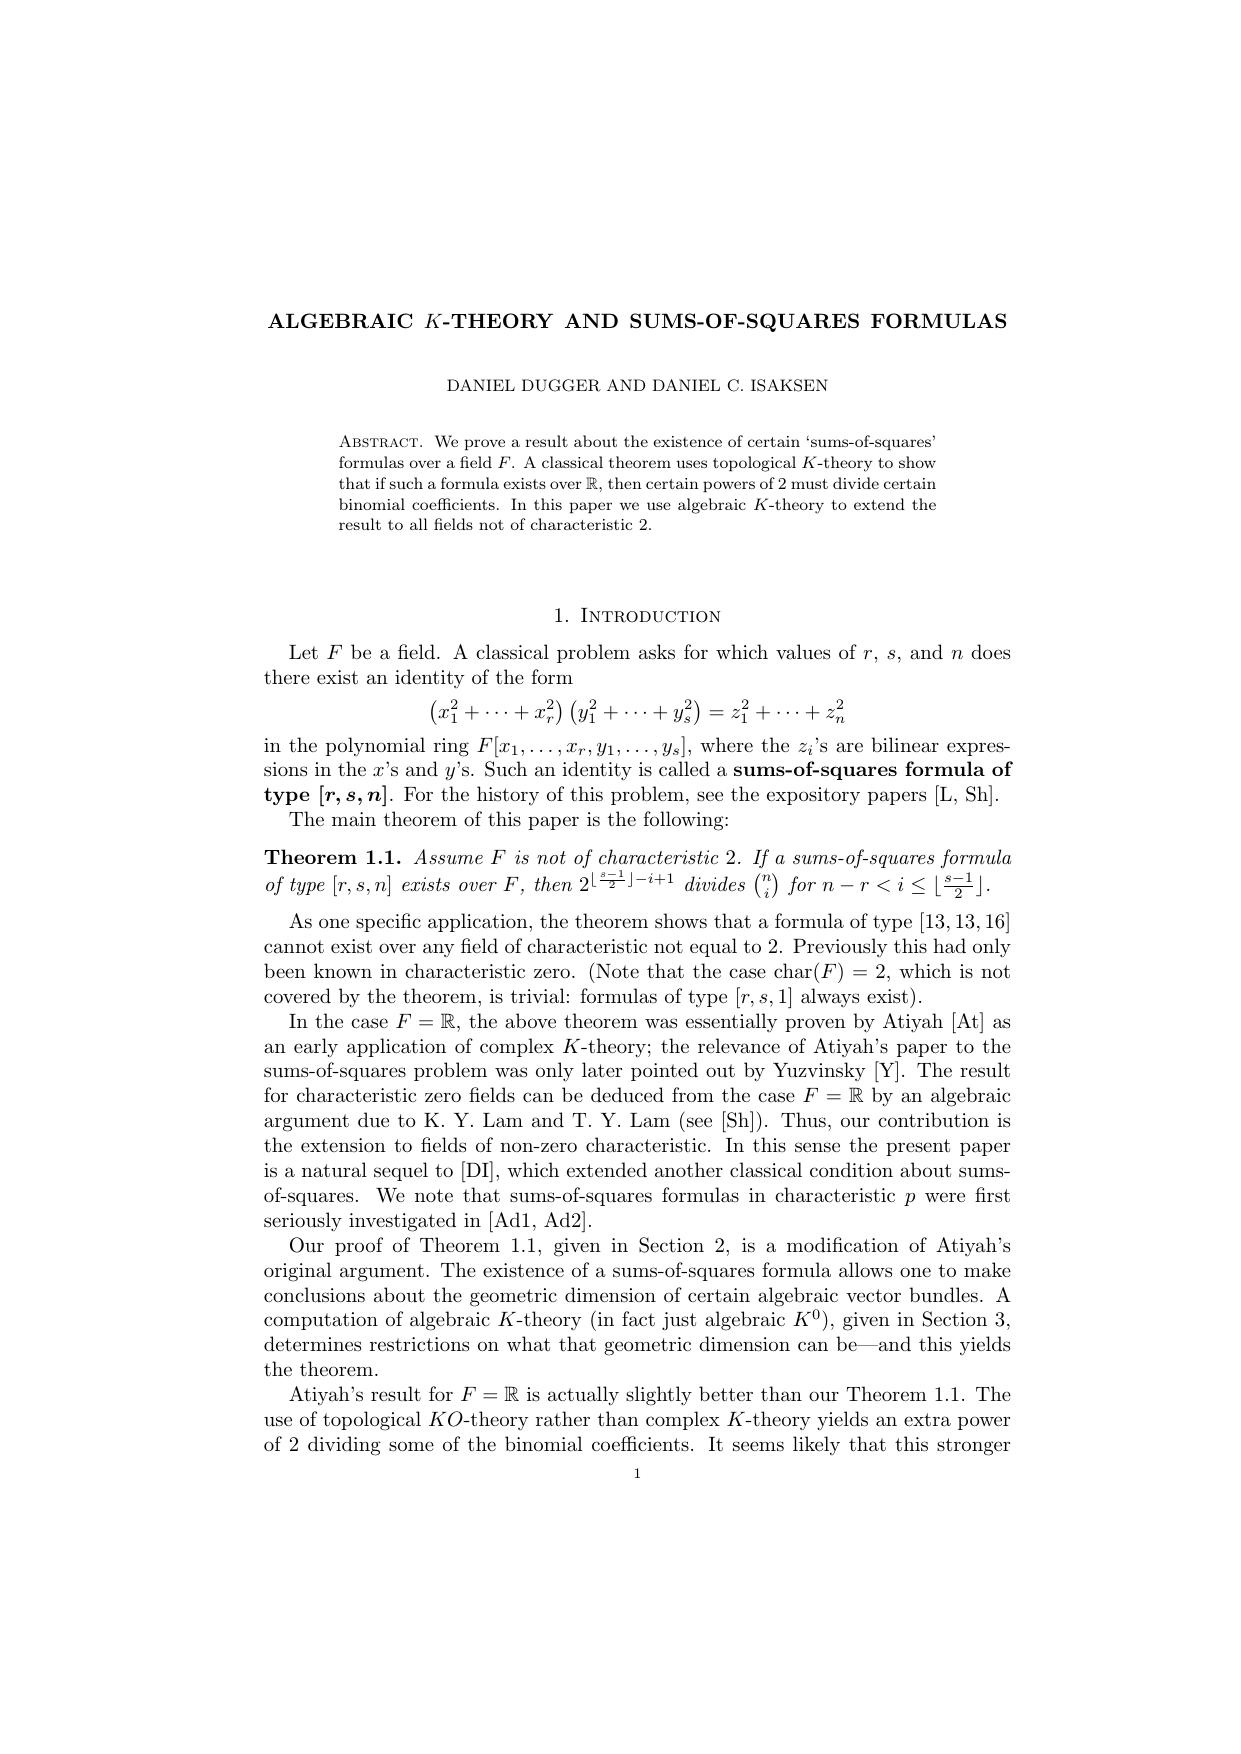 Classical algebraic K-theory